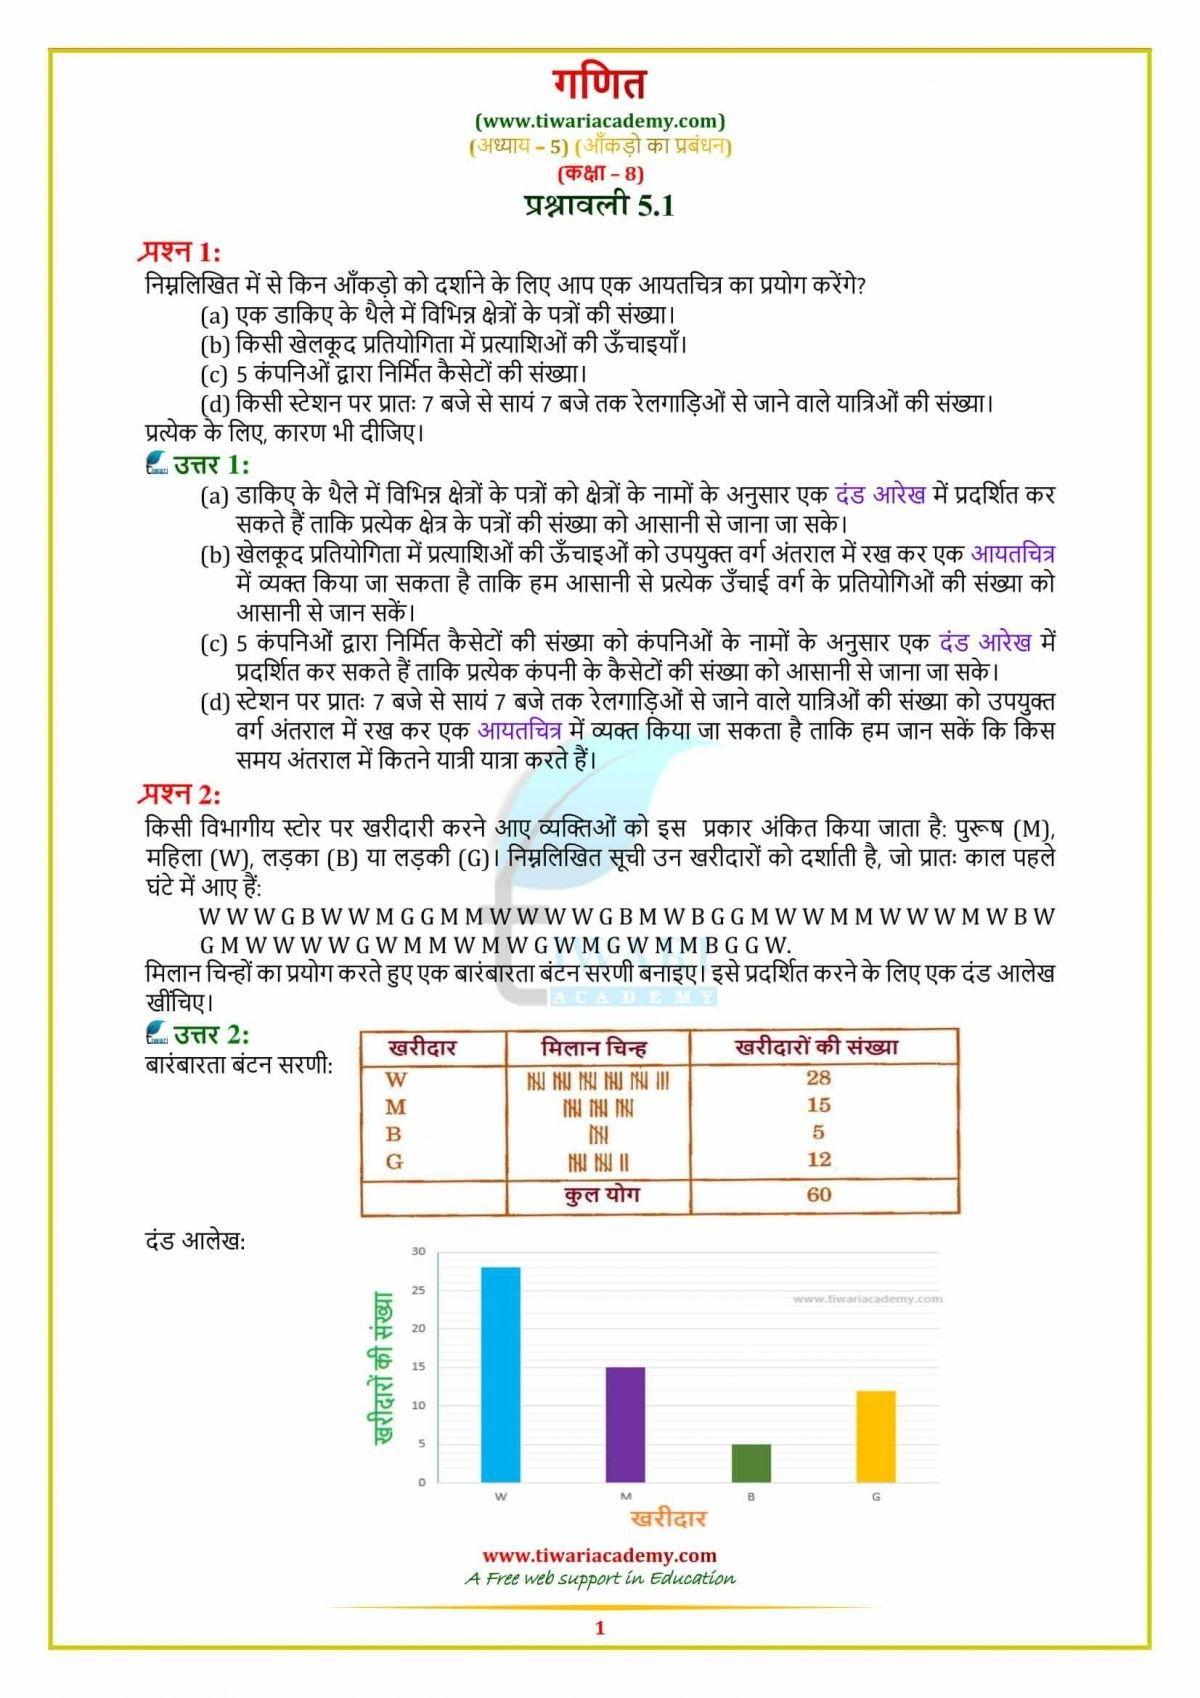 Https Www Tiwariacademy Com Ncert Solutions Ncert Solutions Class 8 Maths Chapter 5 Math Class 8 Solutions [ 1698 x 1200 Pixel ]